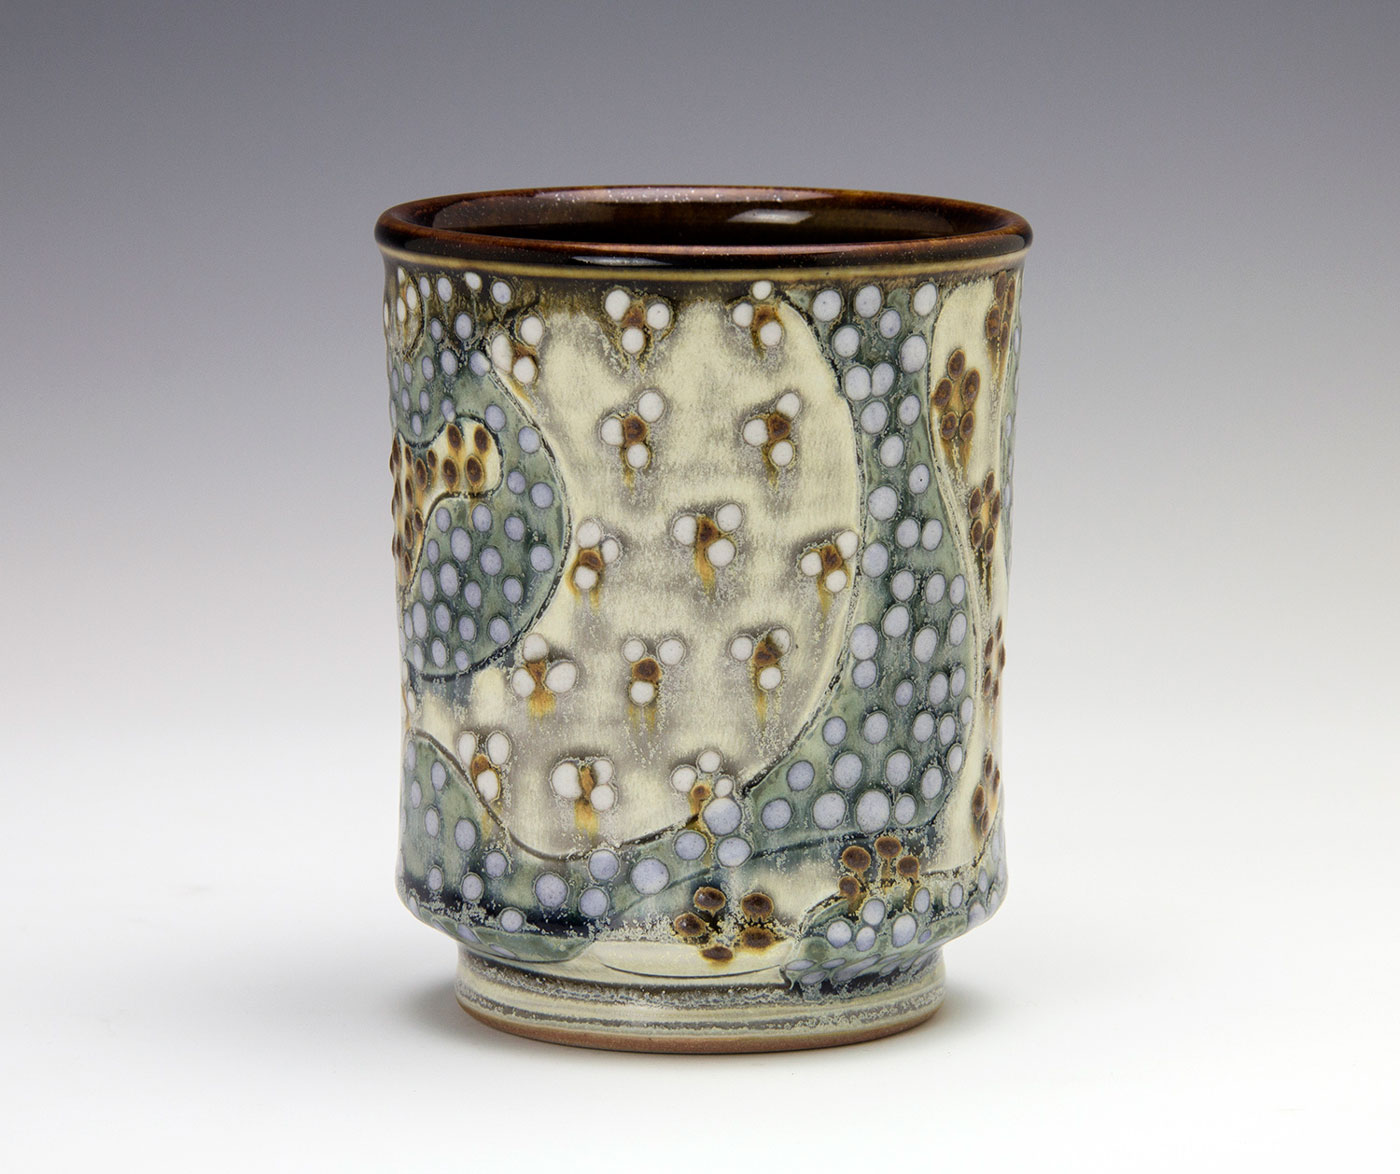 Pattern-Medley-studio-pottery-cup-Samantha-Henneke-Seagrove-North-Carolina.jpg